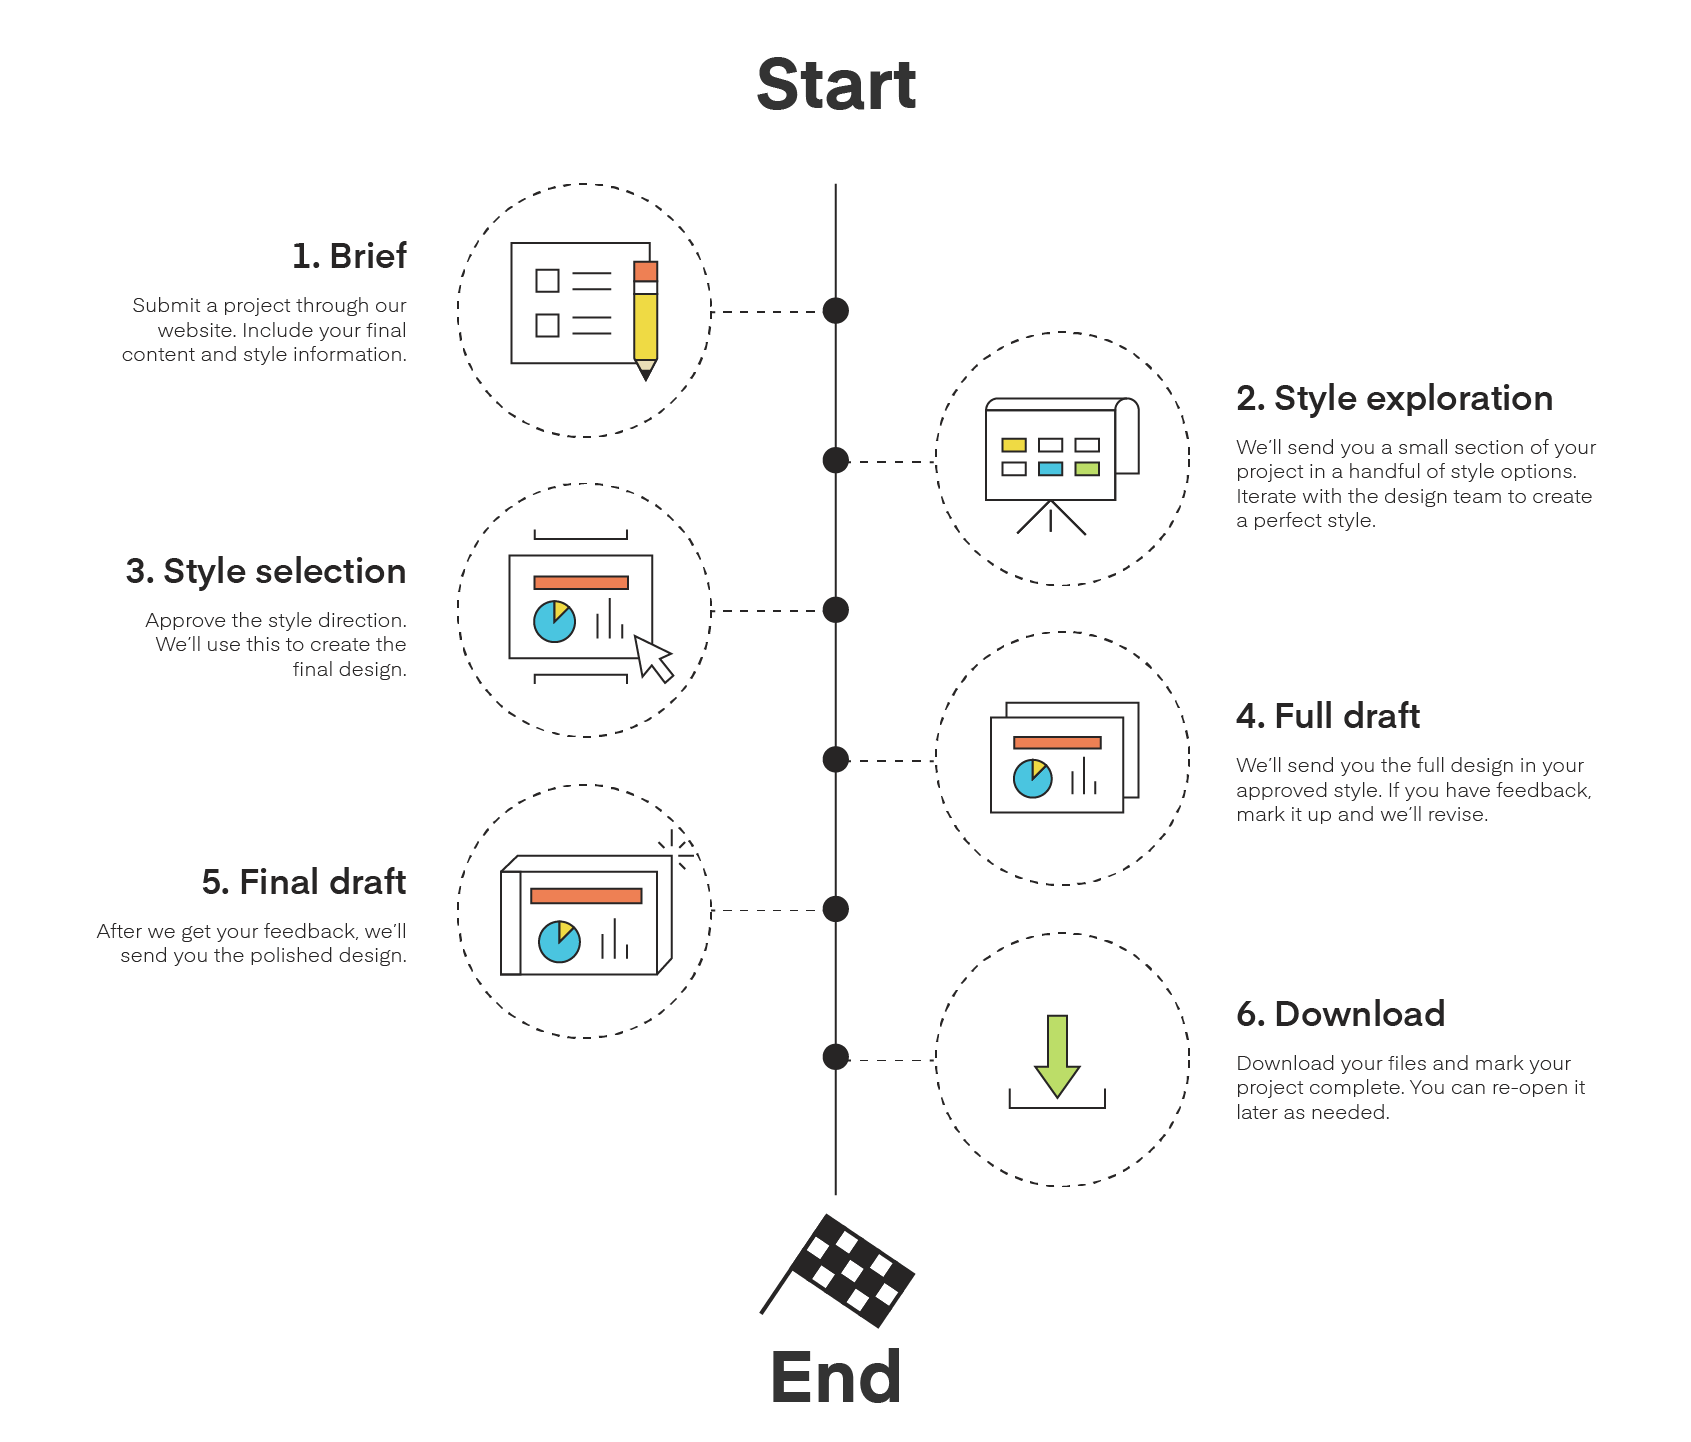 Project steps timeline